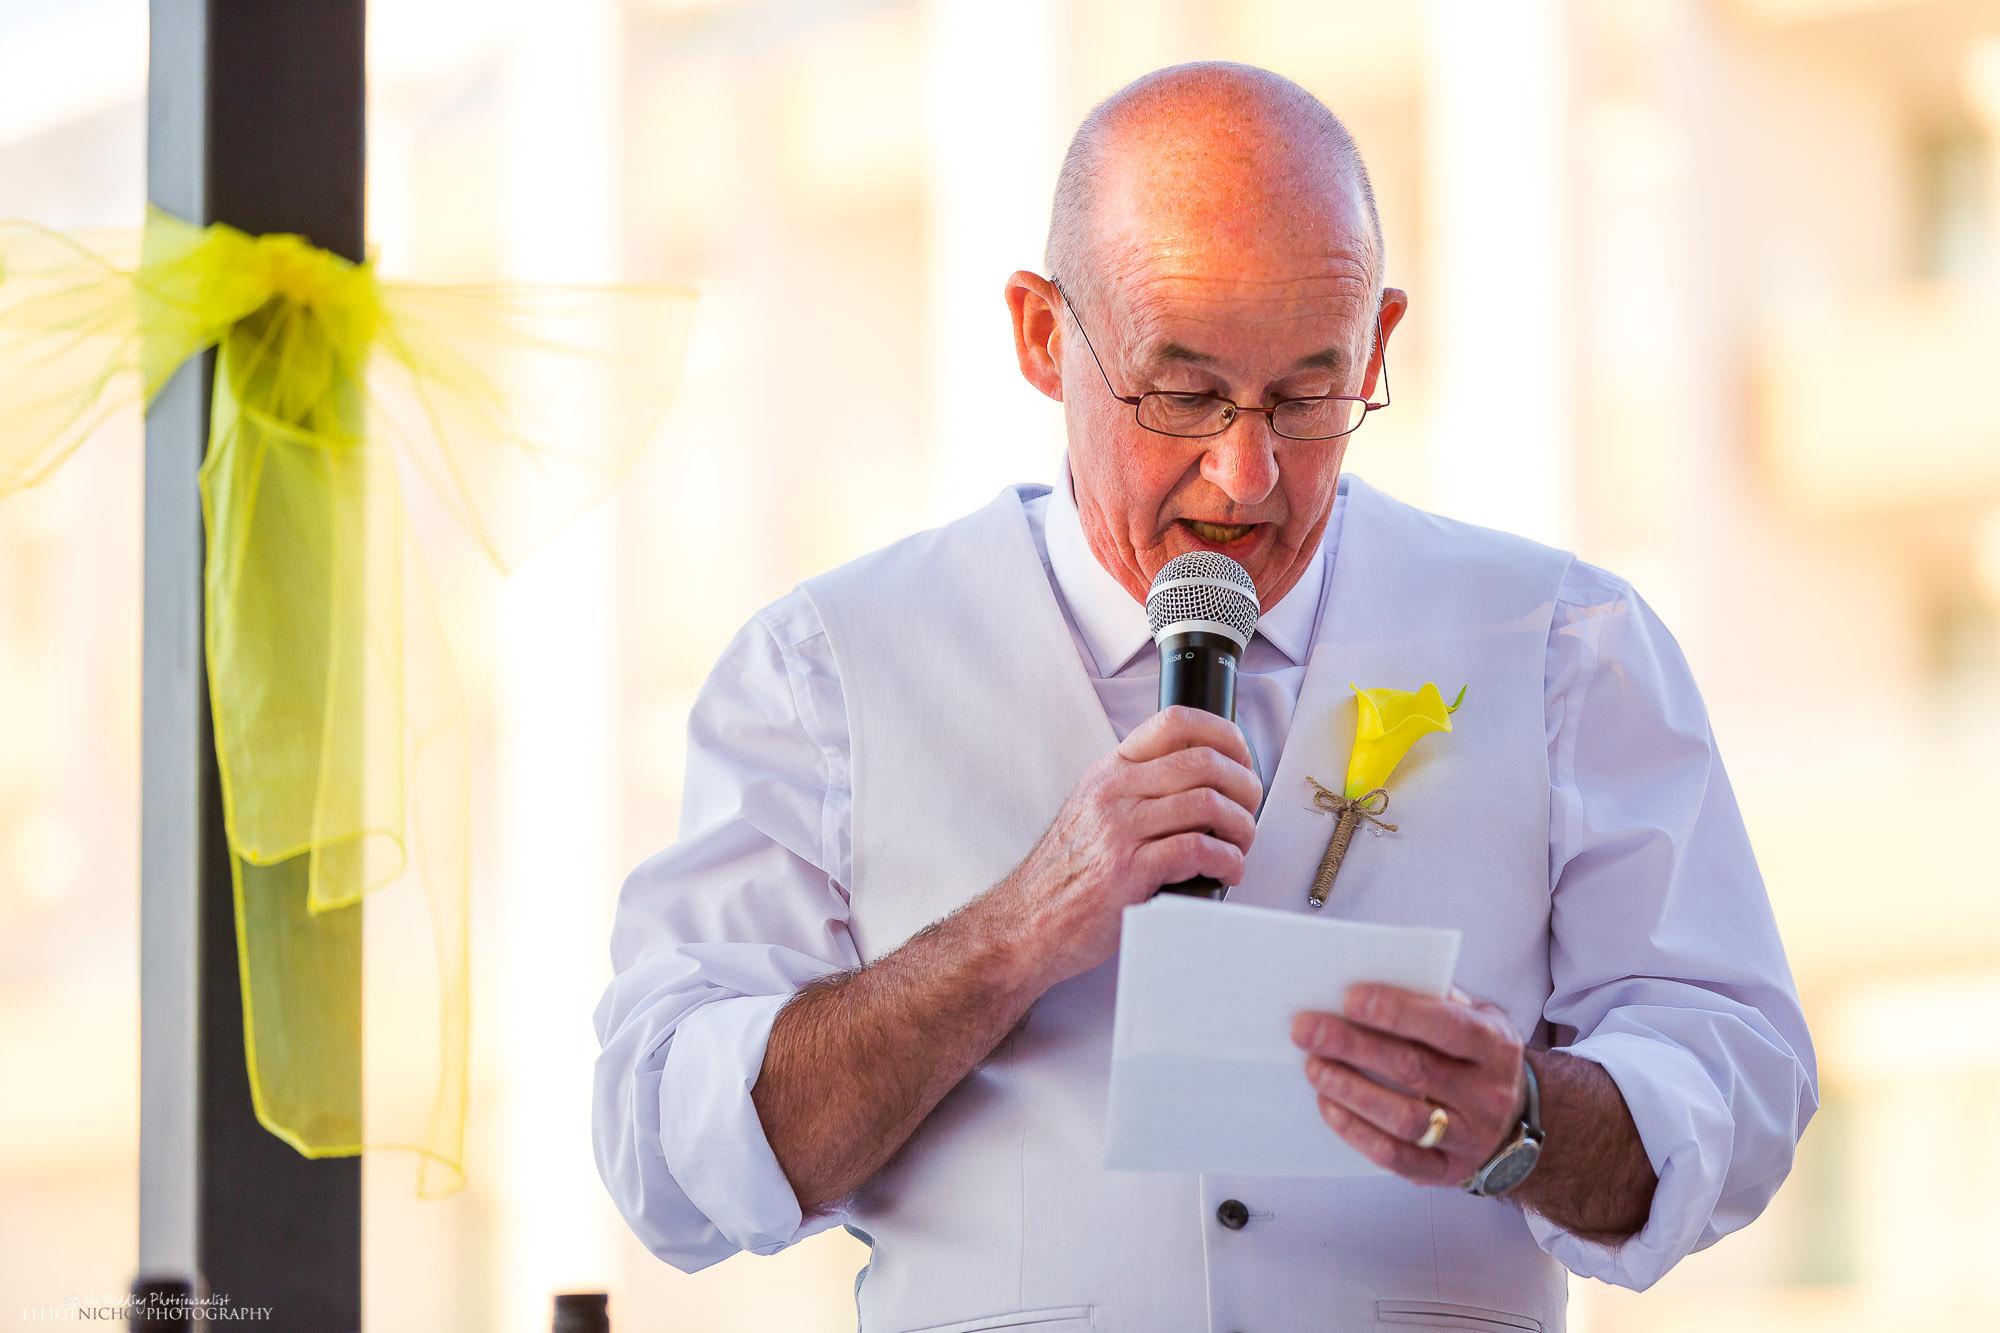 father-wedding-reception-speech-destination-photography